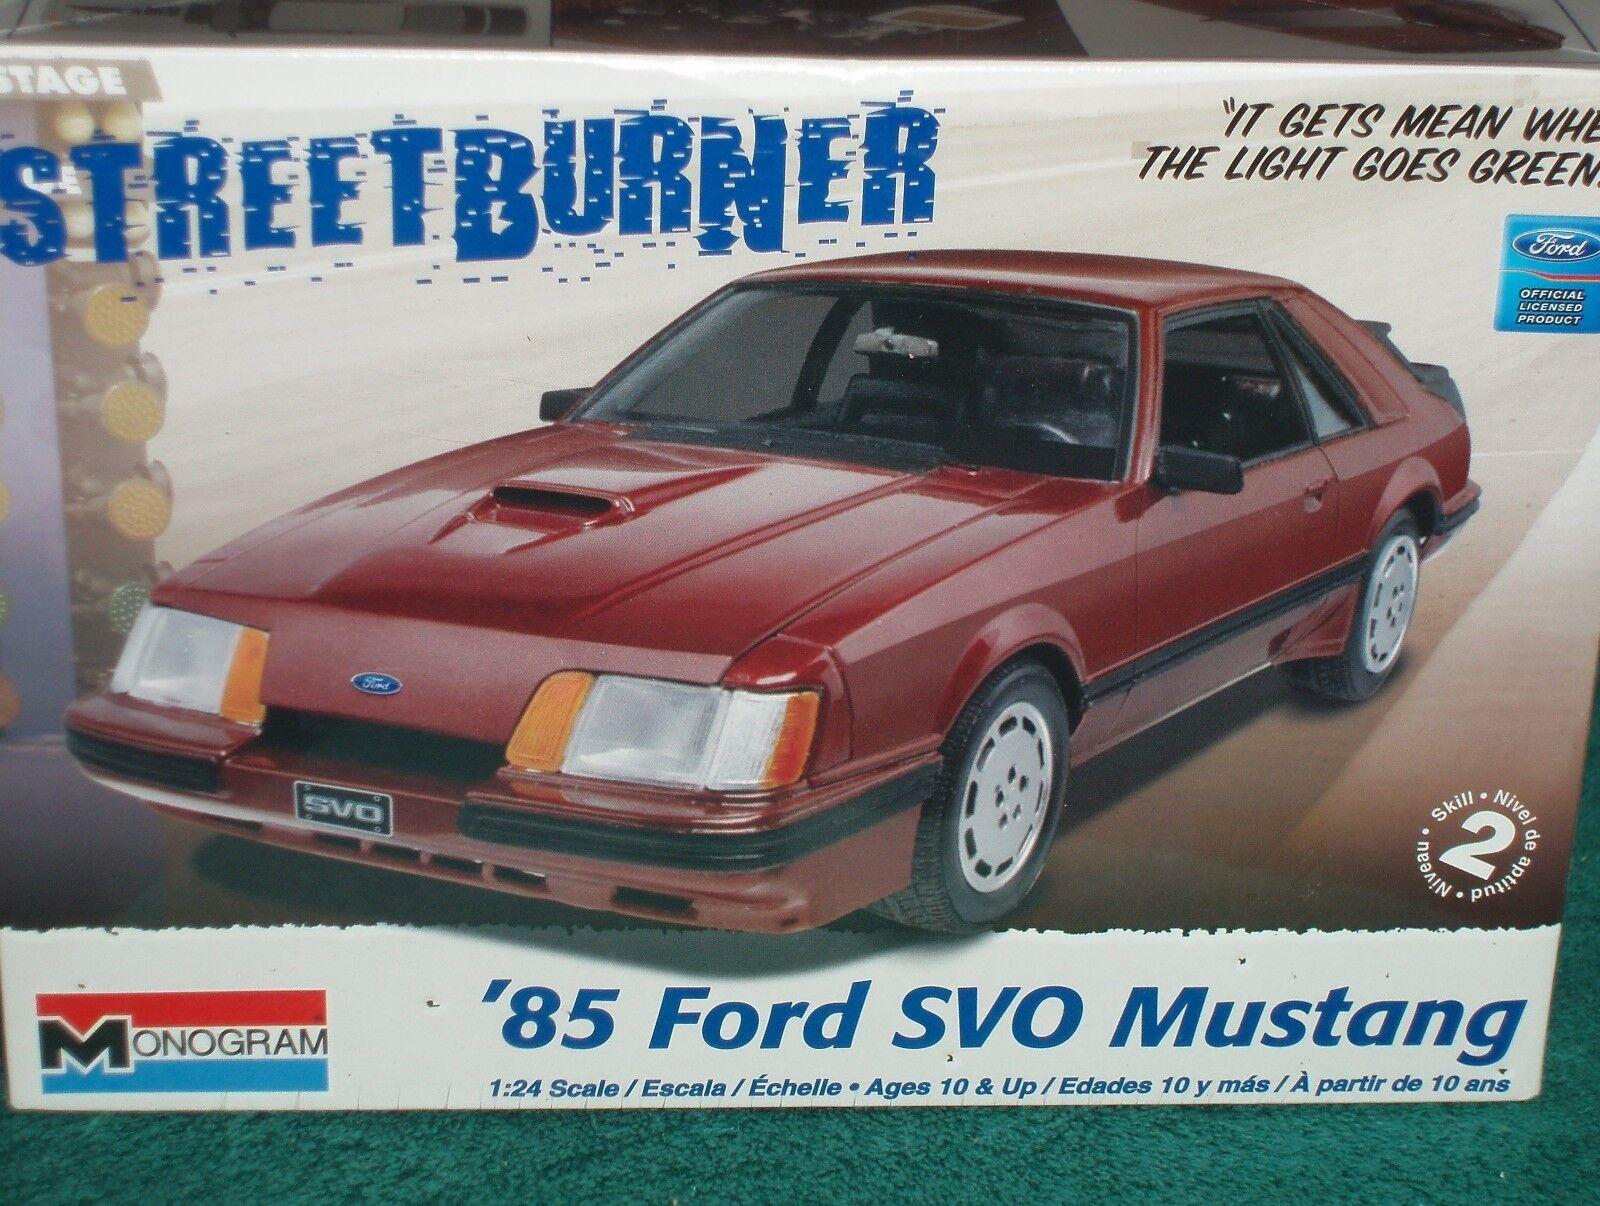 Monogram 1985 FORD MUSTANG SVO Kit Plastique Scellé 1 25 Skill 2  STREET BURNER